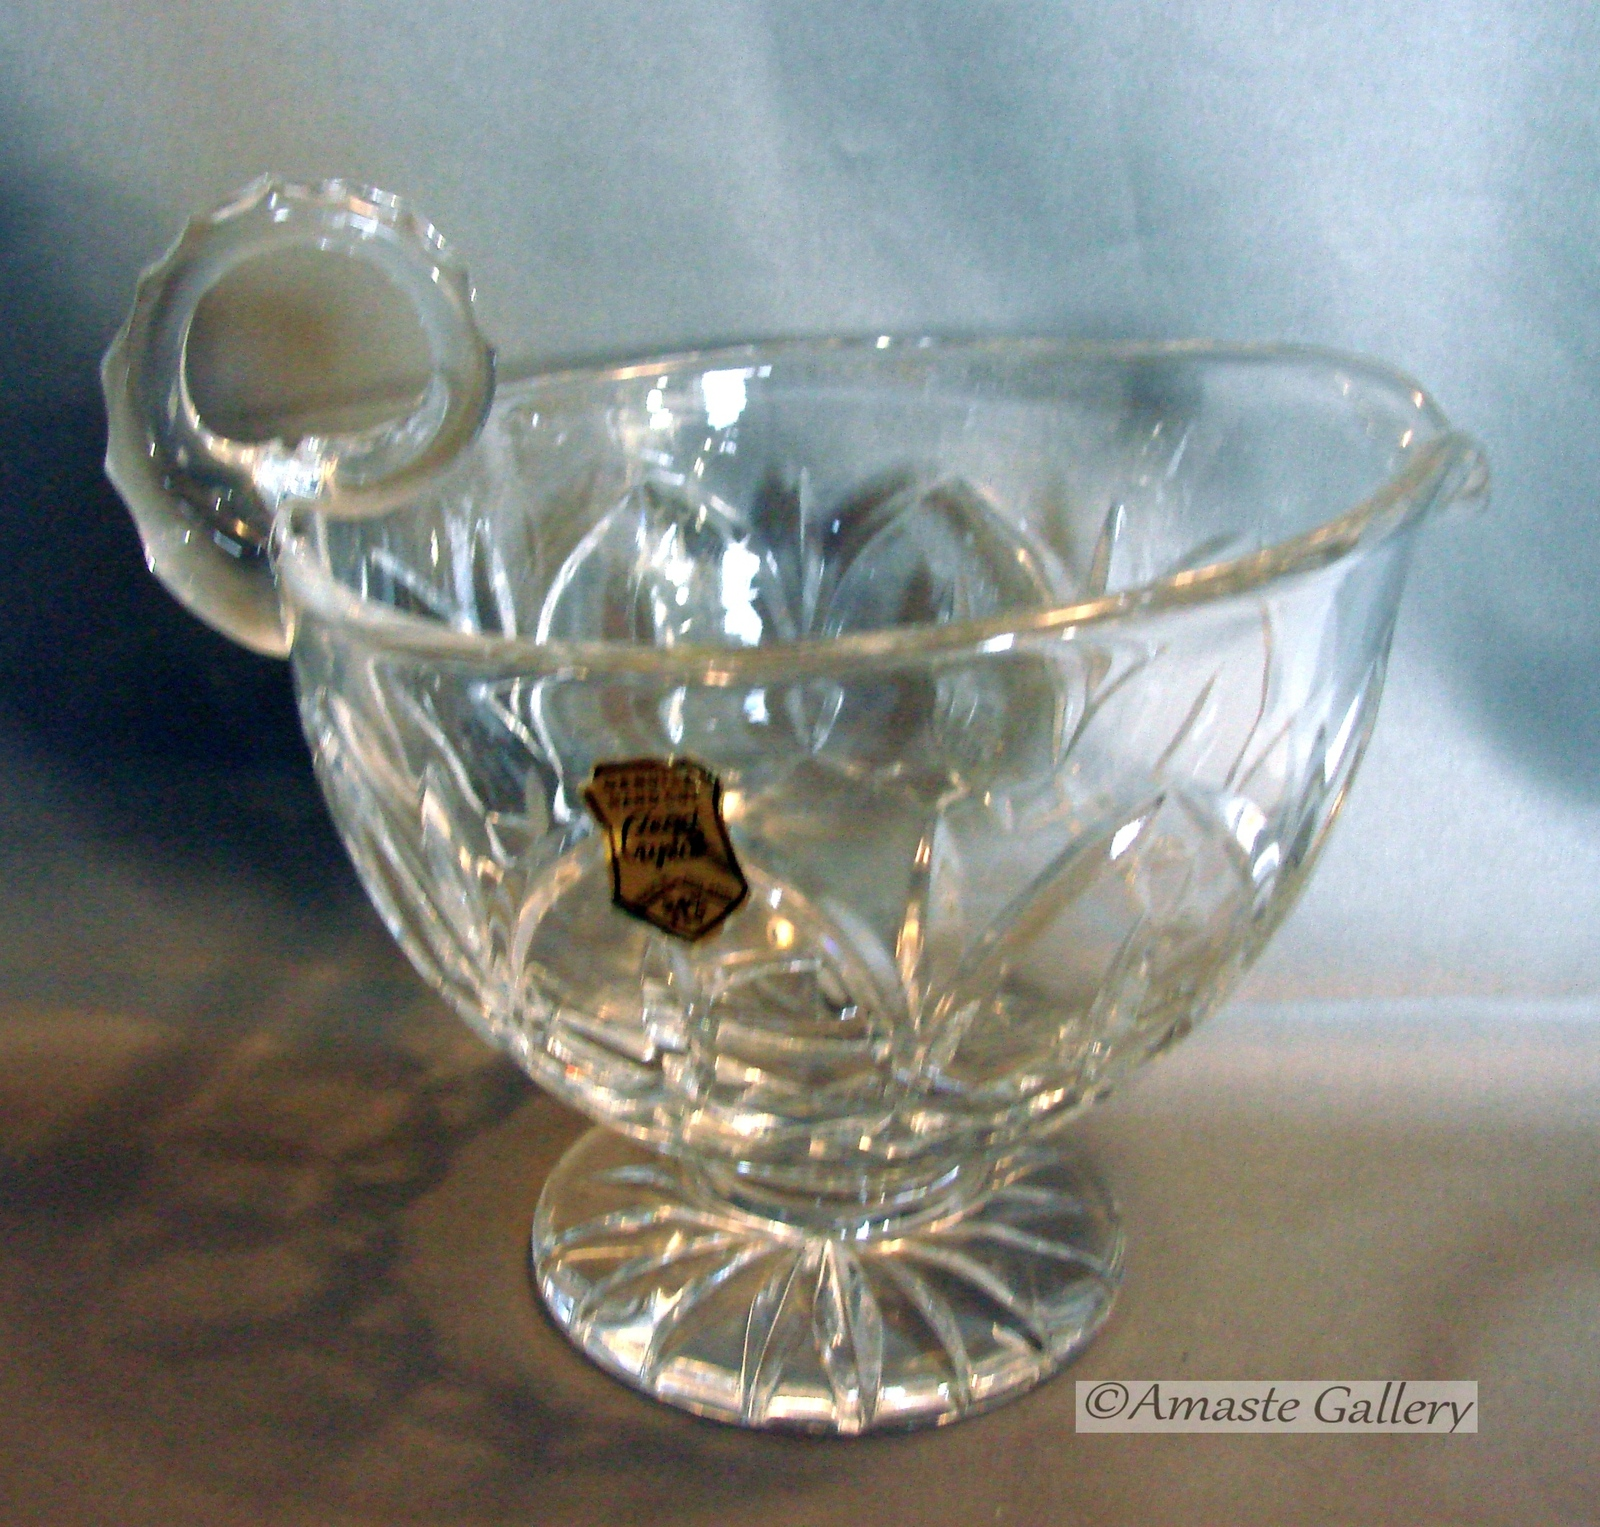 Pottery & Glass Honesty Crystal Bowl 24% Cut Lead Hand Cut Crystal